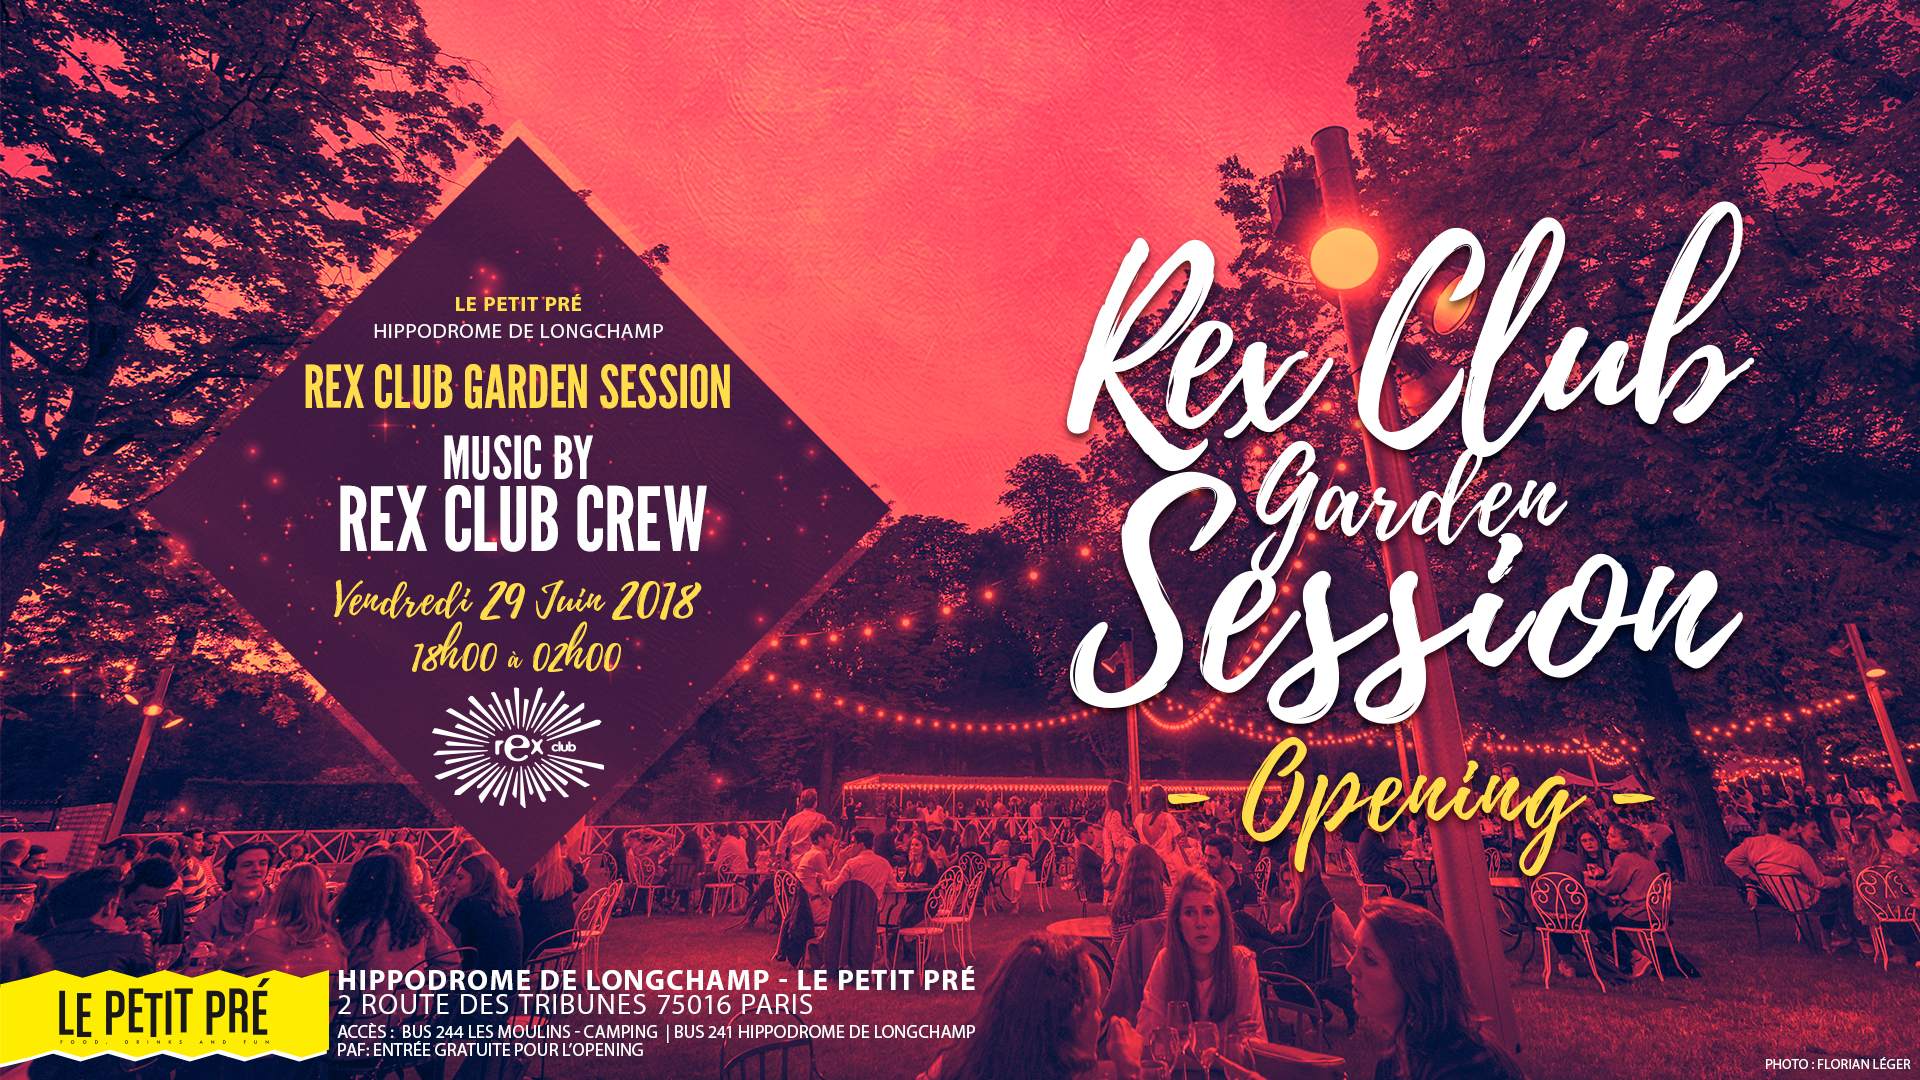 20180629_rex_club_garden_session_facebook_event_banner_1920x1080